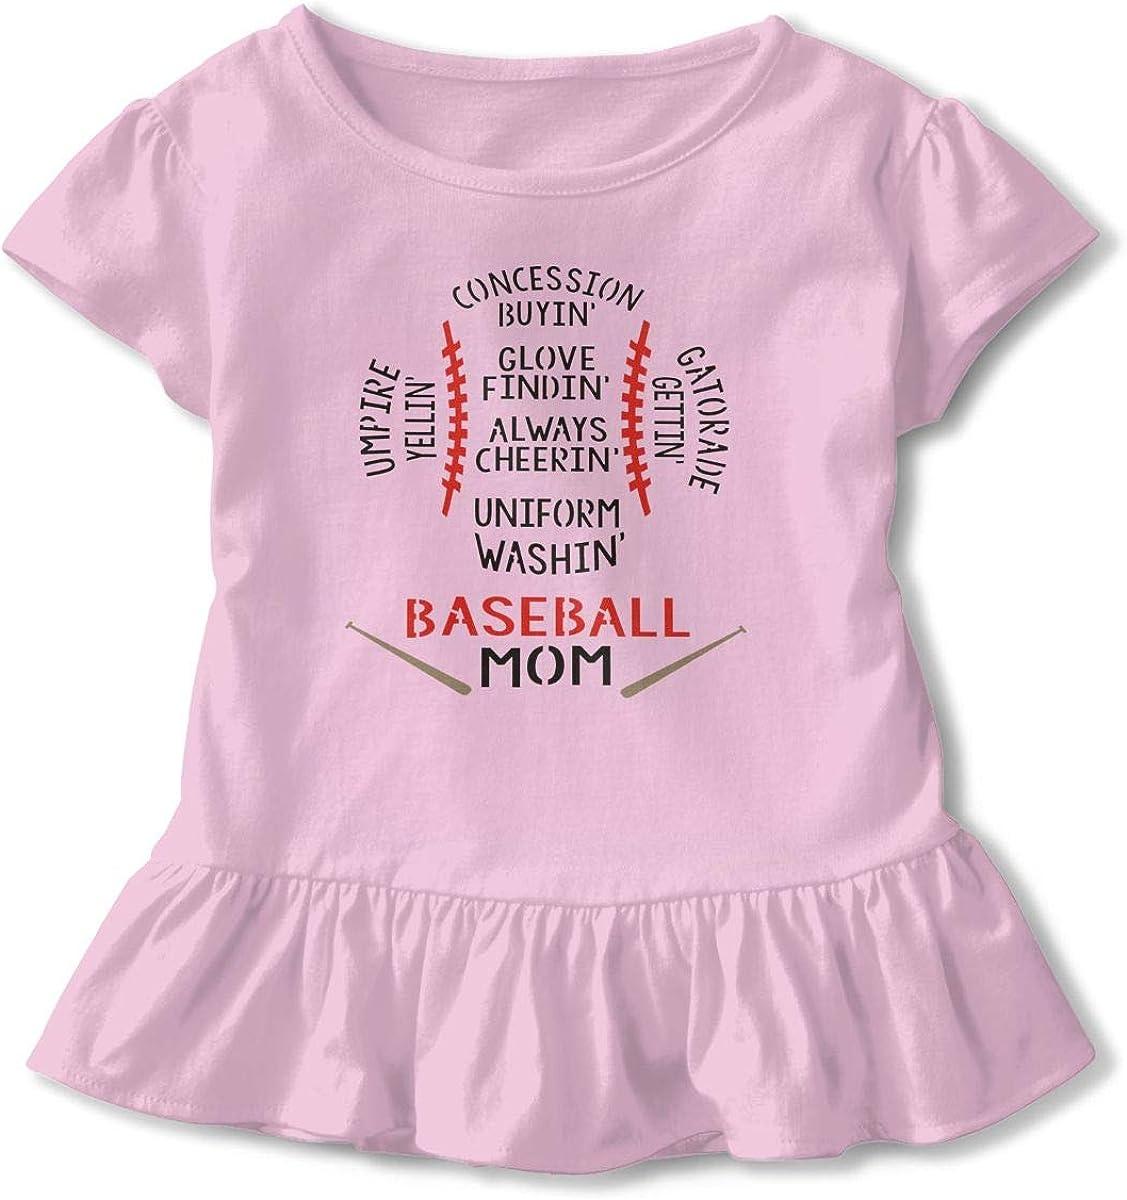 Baby Boys Girls Romper Jumpsuit Baseball Mom Newborn Short Sleeve Bodysuits Infant Outfit Funny Onesie for 0-2T